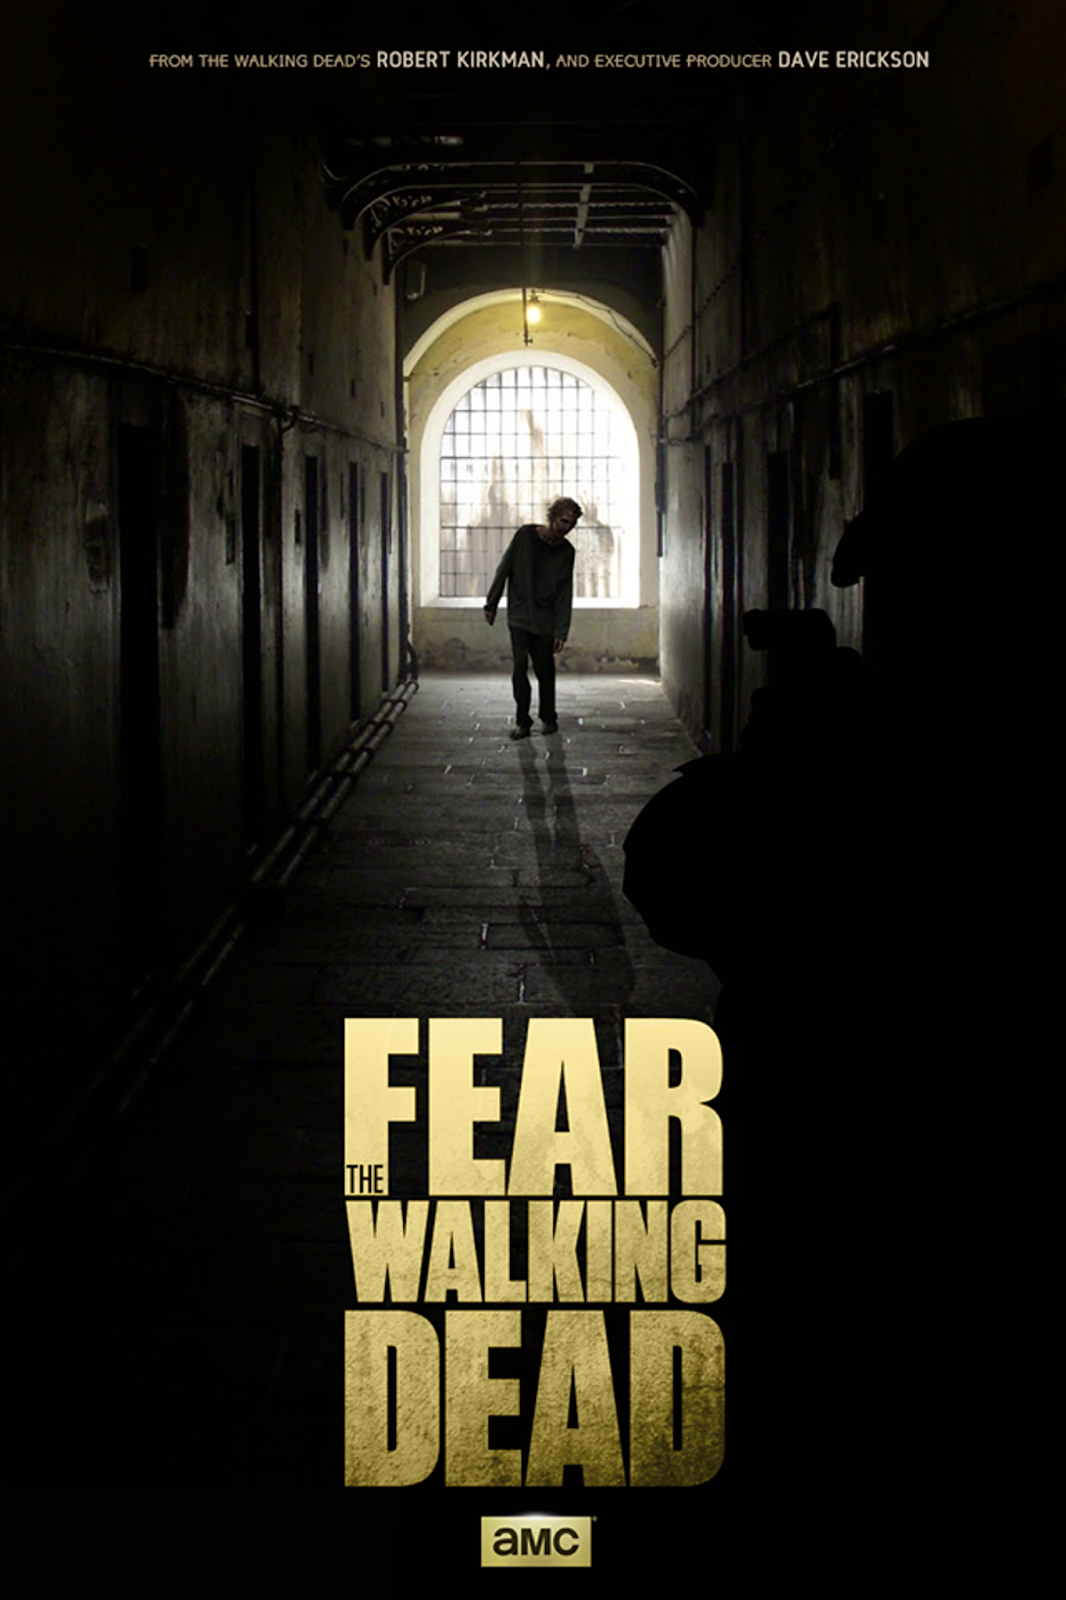 http://megadescargas-series.blogspot.com/2016/08/fear-walking-dead-serie-completa-esp-castellano.html